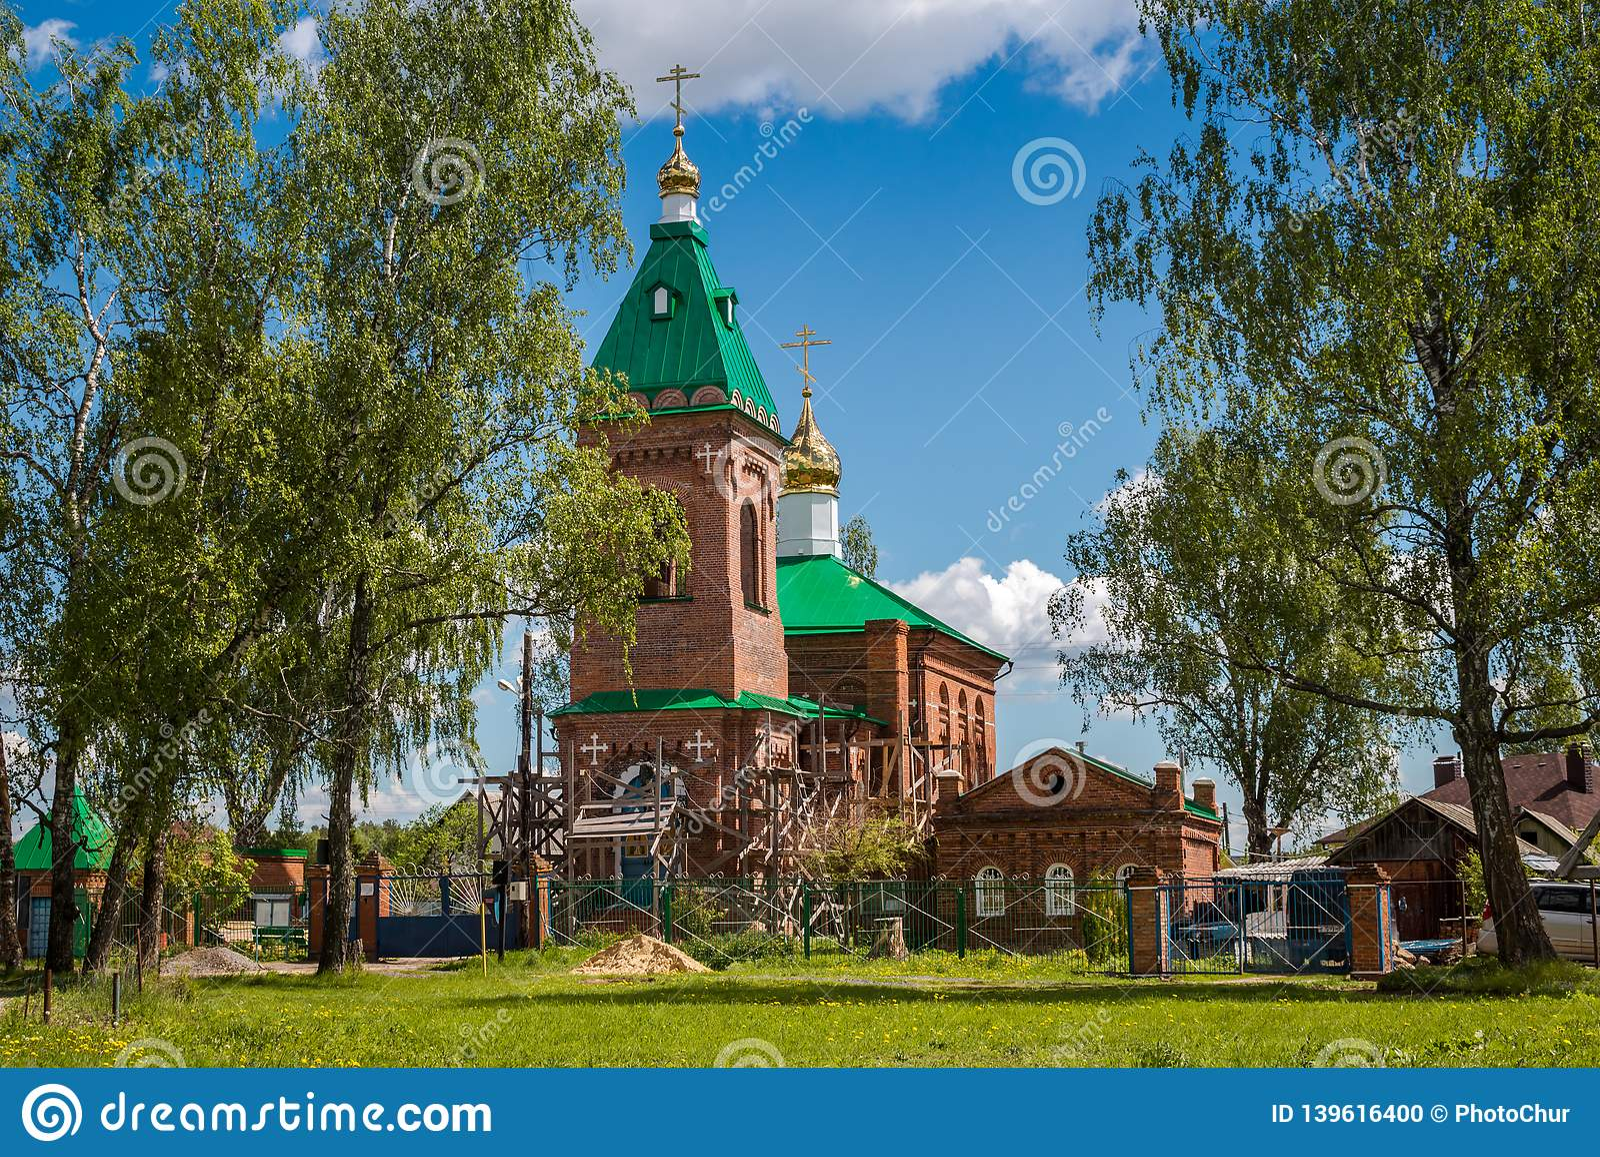 PEREDOL, RUSSIE - MAI 2017 : Église de Saint-Nicolas